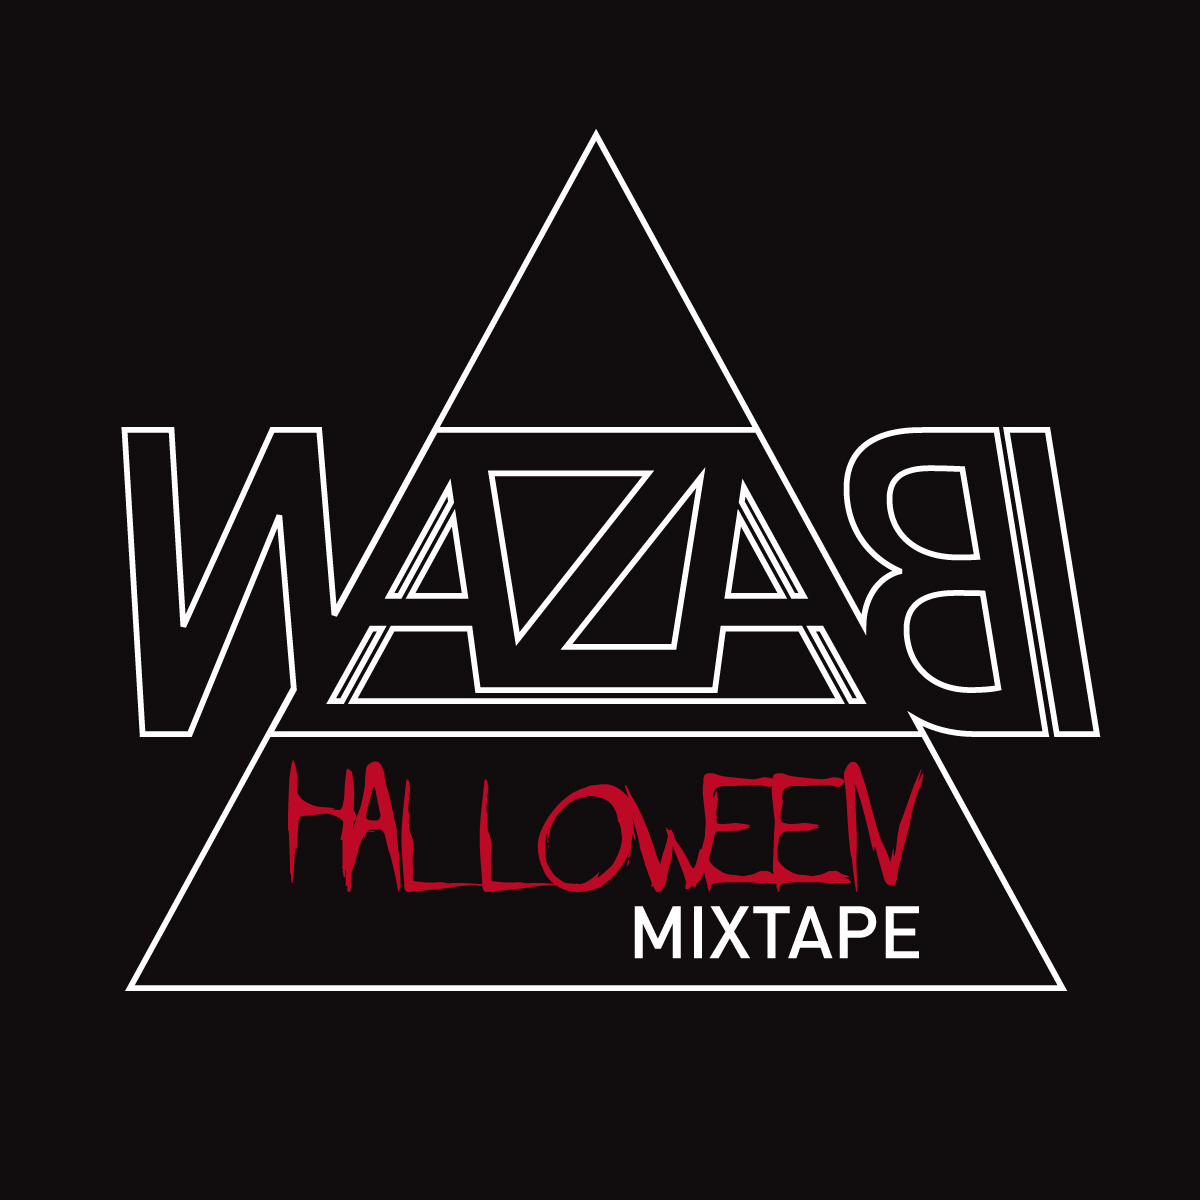 i love to bang!: wazabi - halloween mixtape - mixtapes und livesets